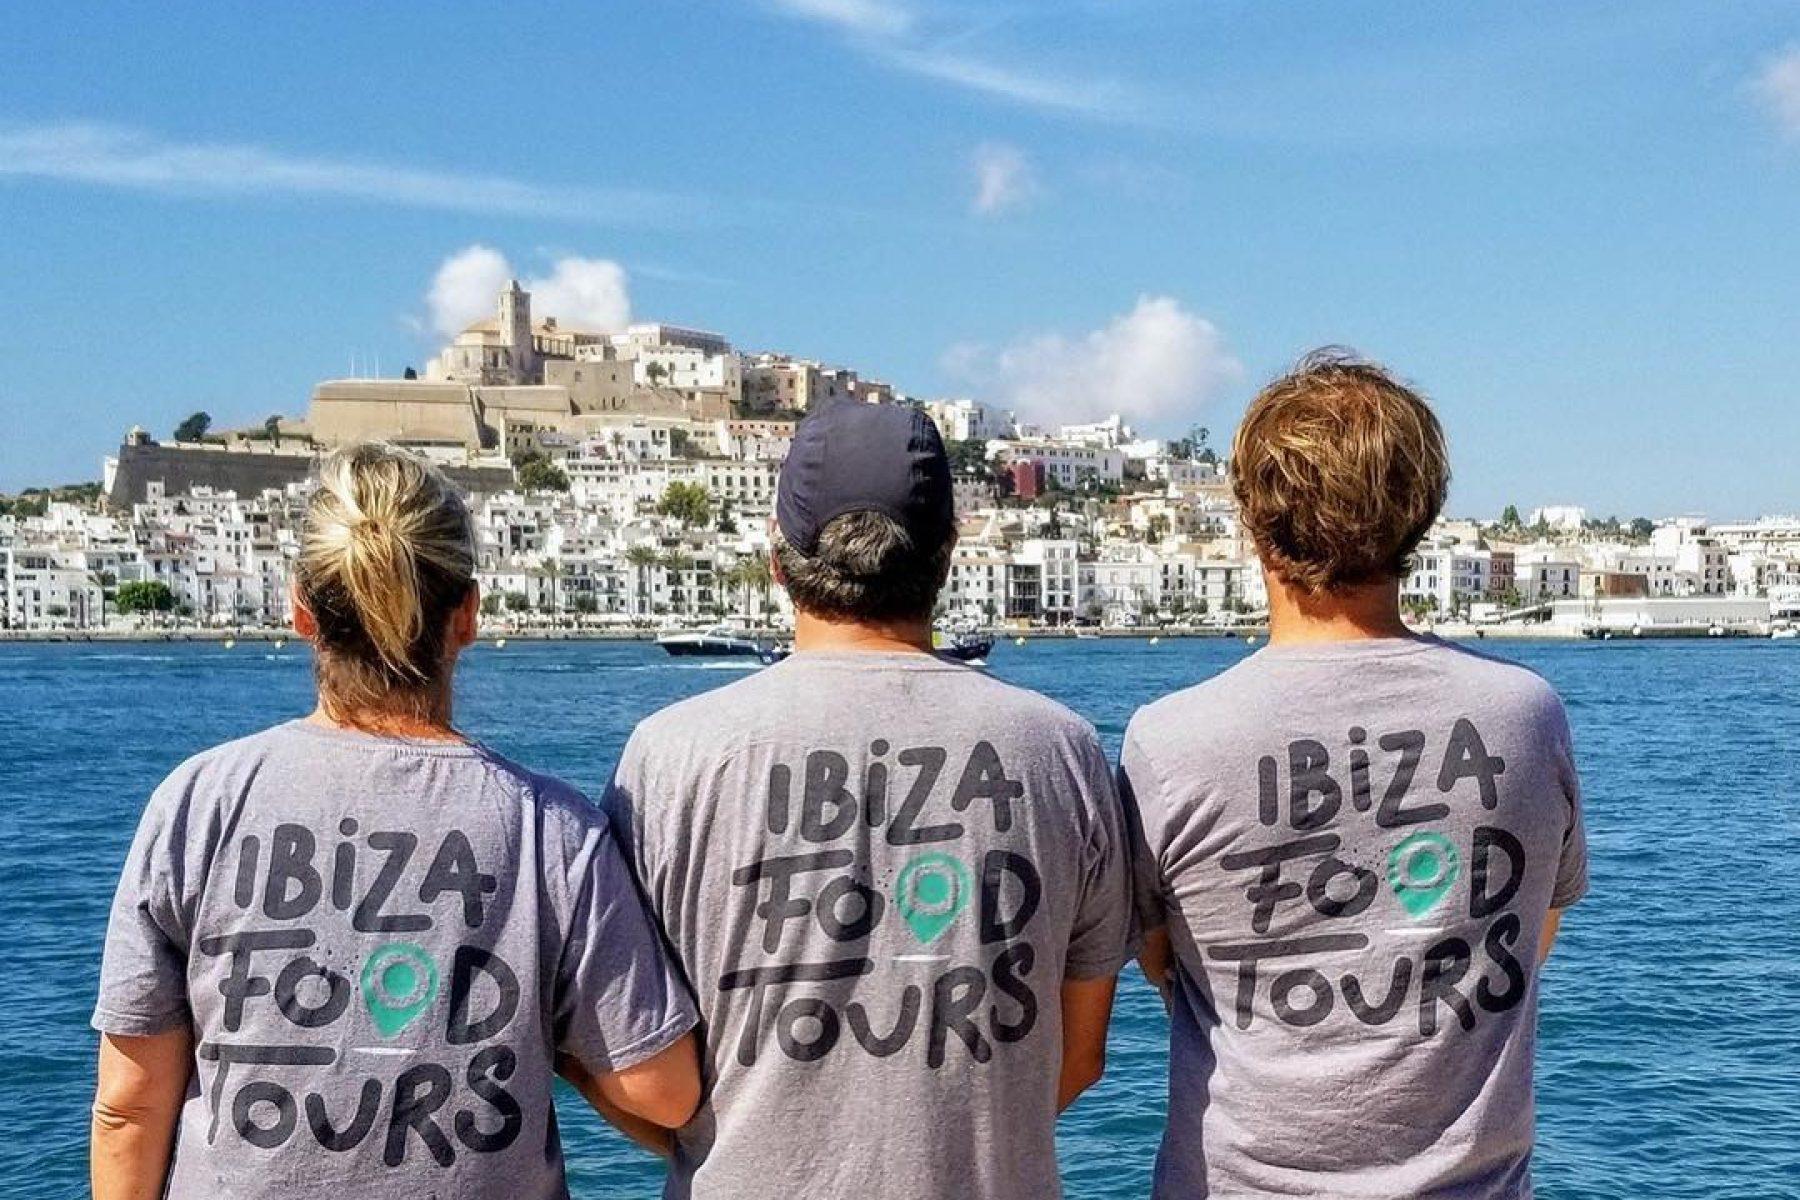 Food Tours in Ibiza